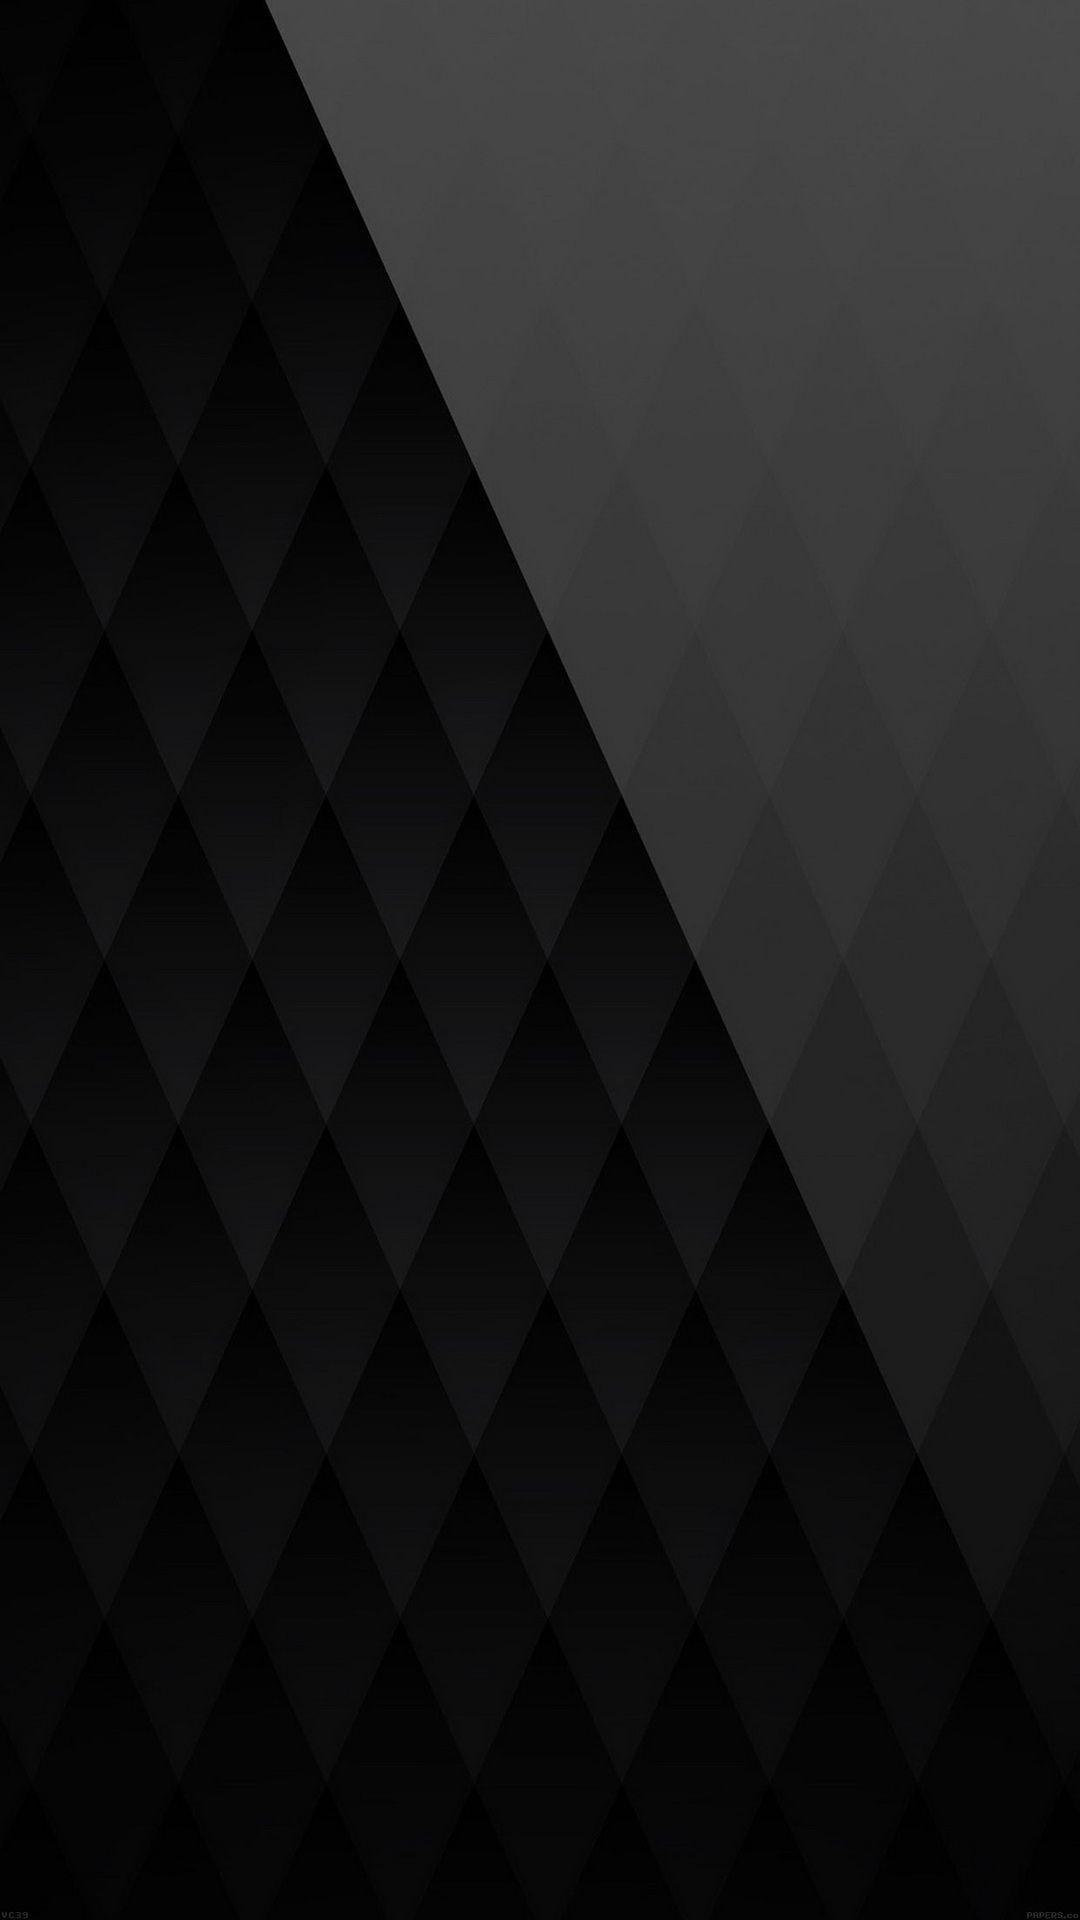 Diamond Pattern Wallpapers Hd Hd Wallpapers Pinterest Galaxy Wallpaper Gambar Grafit Wallpaper Ponsel